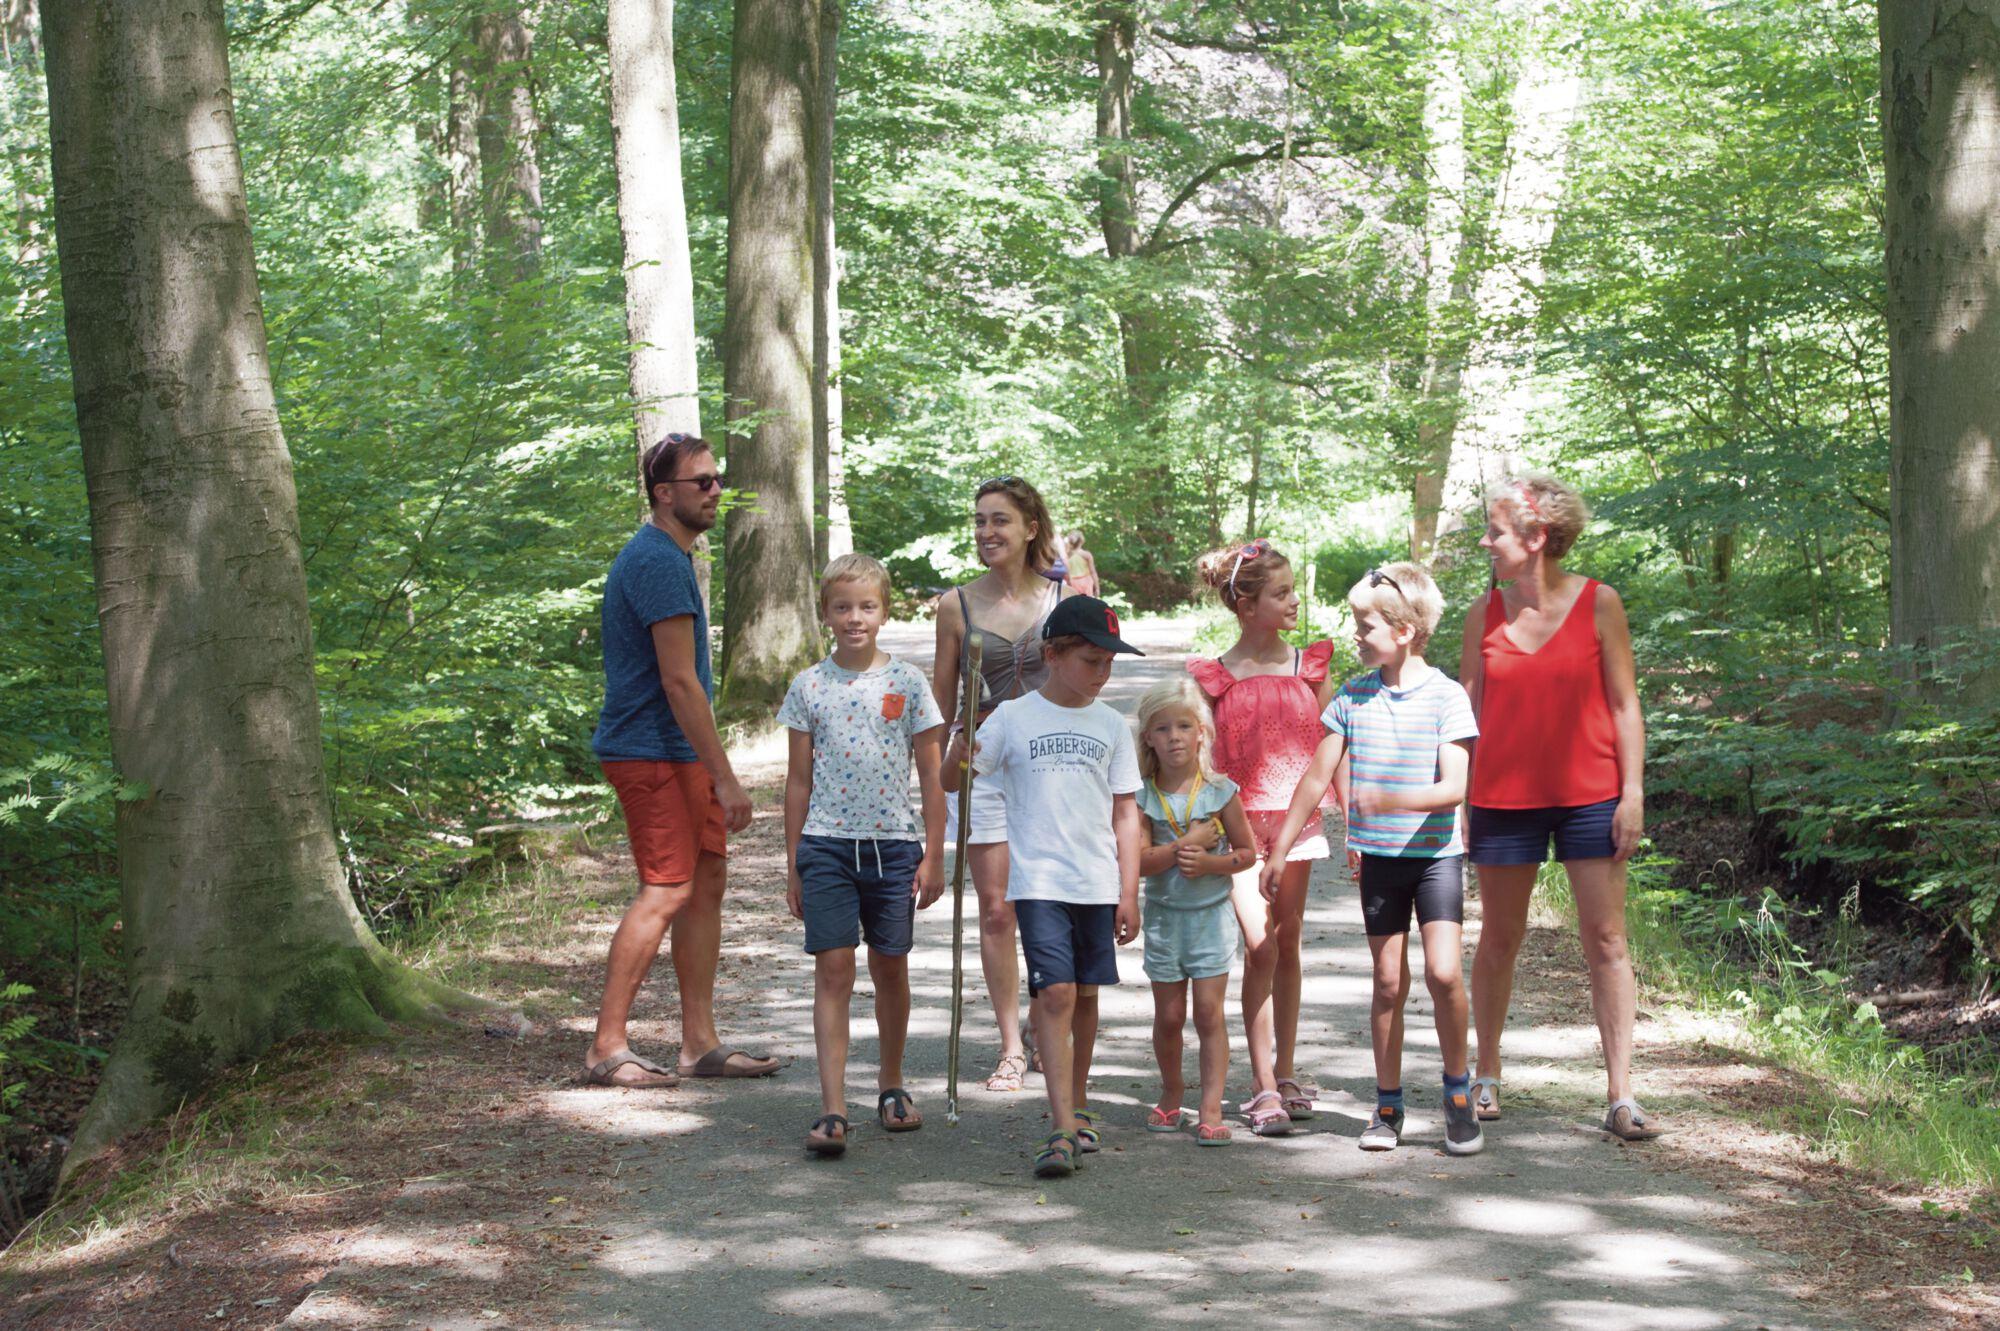 20180701 Speel erop bos Het Leen (14).jpg